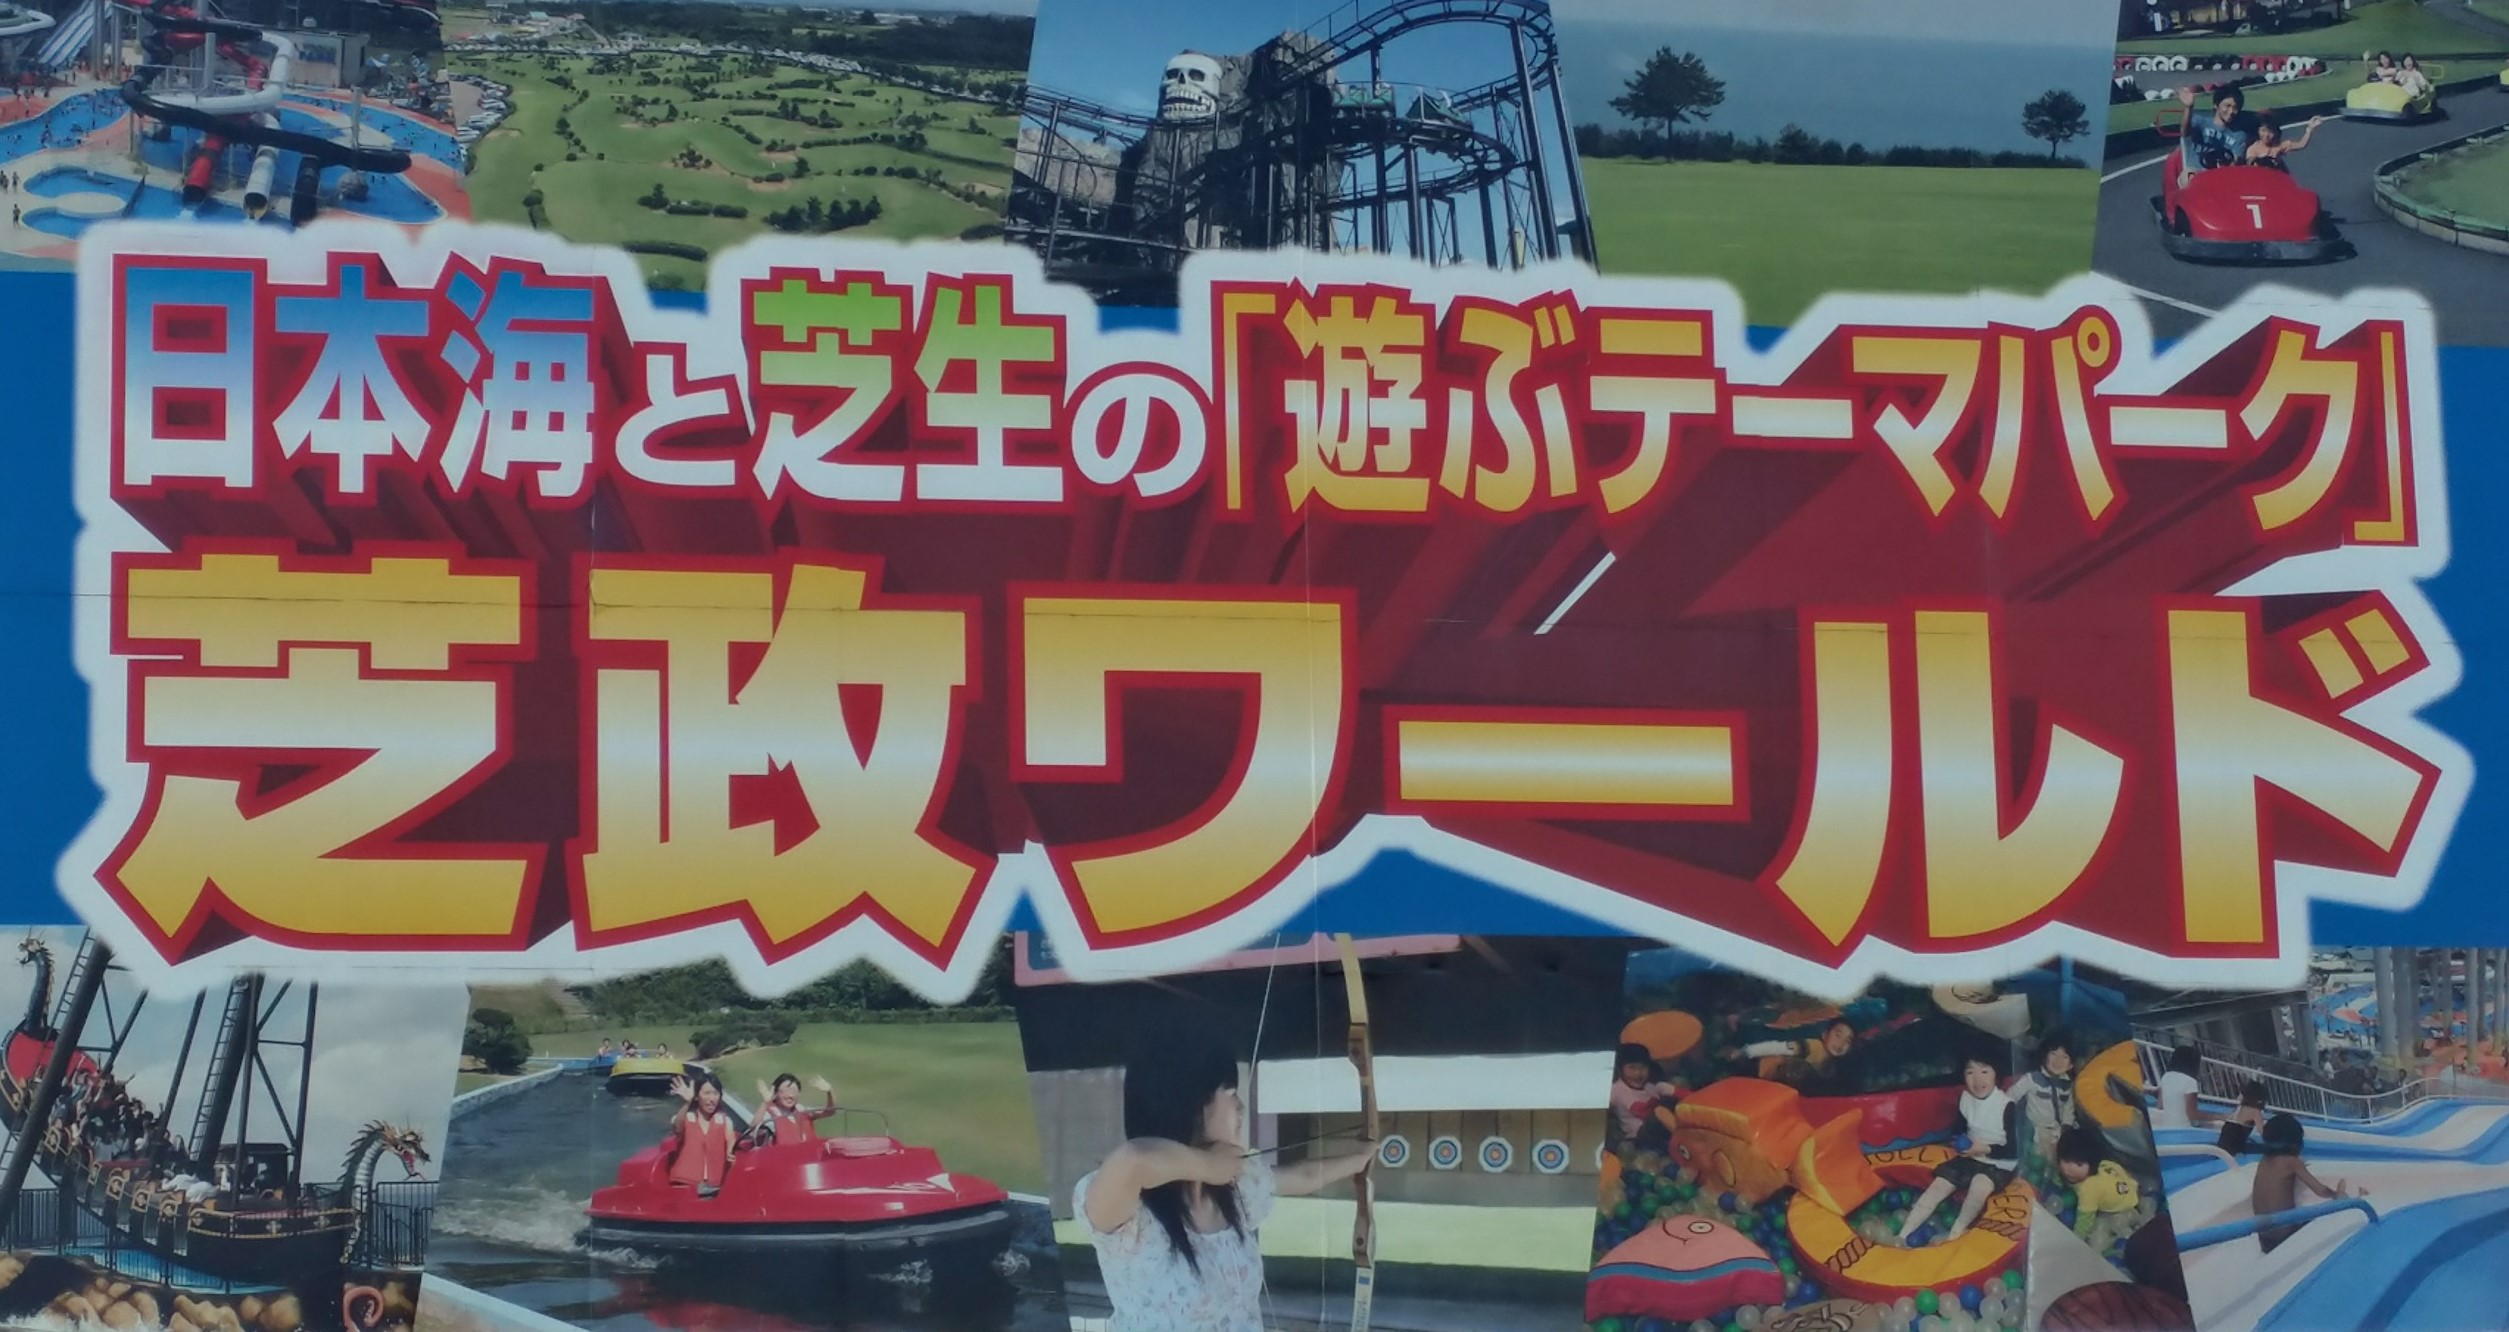 芝政ワールド(福井県坂井市)